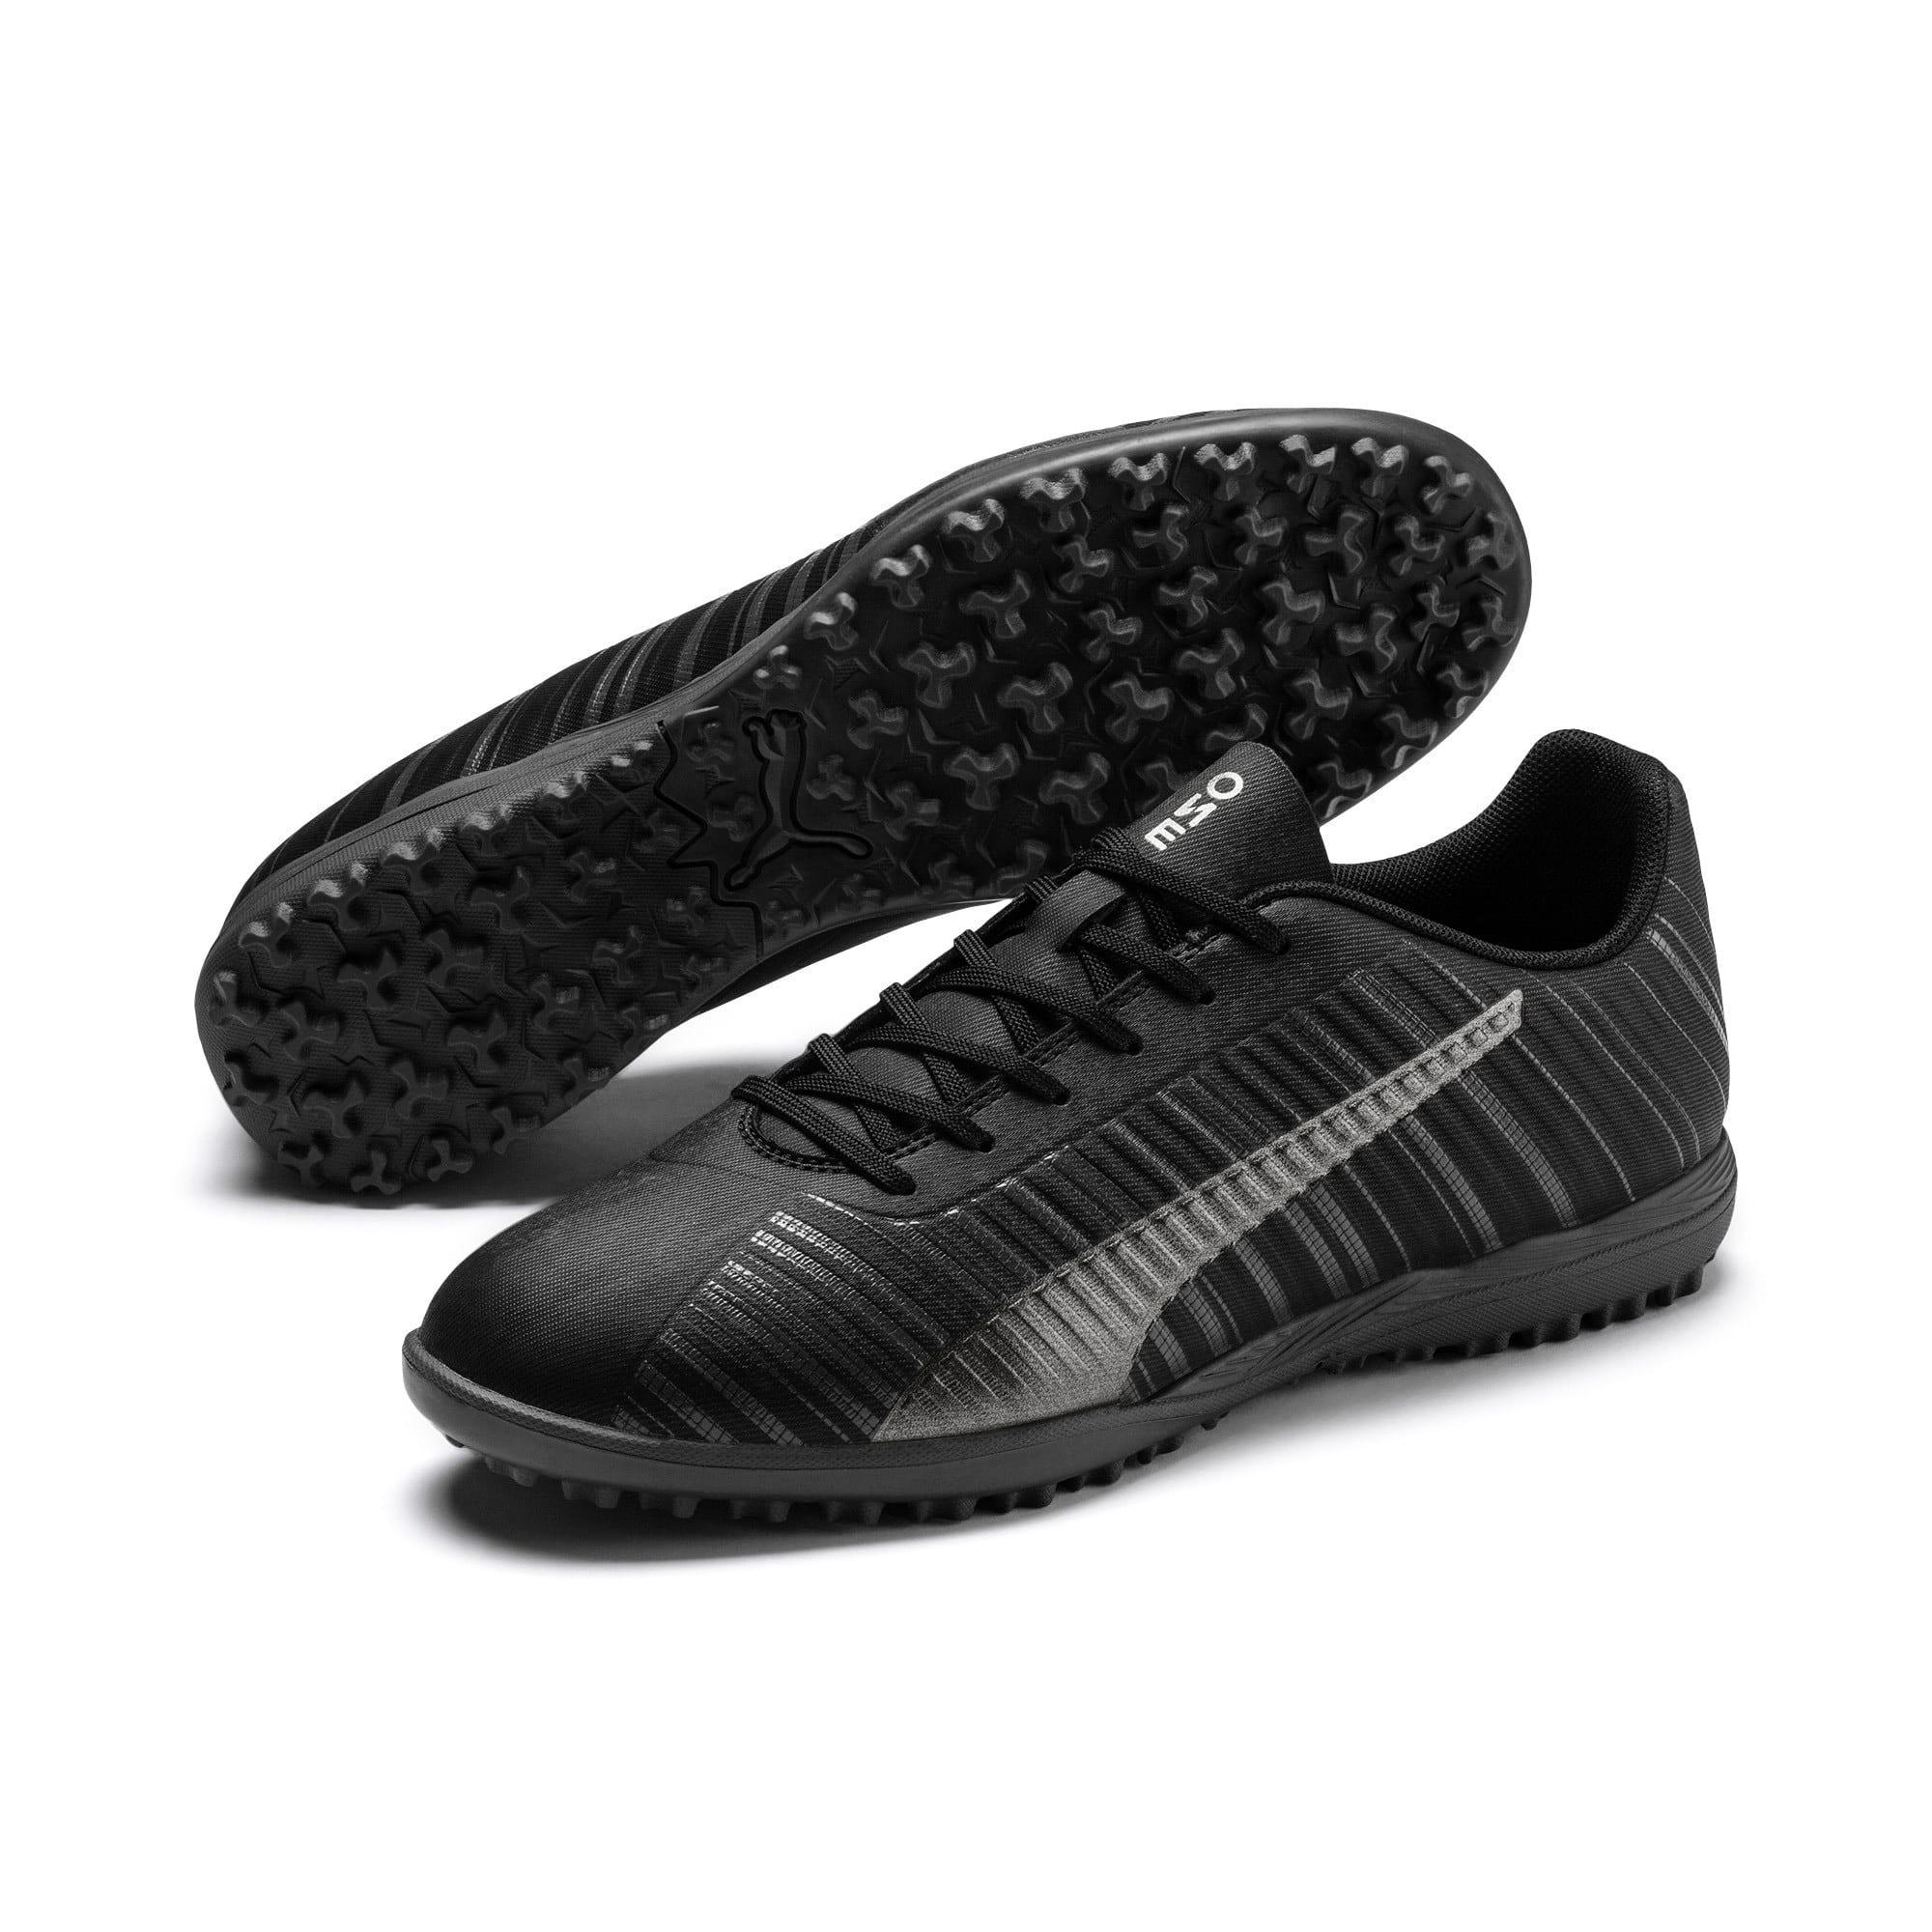 Thumbnail 3 of PUMA ONE 5.4 TT Men's Football Boots, Black-Black-Puma Aged Silver, medium